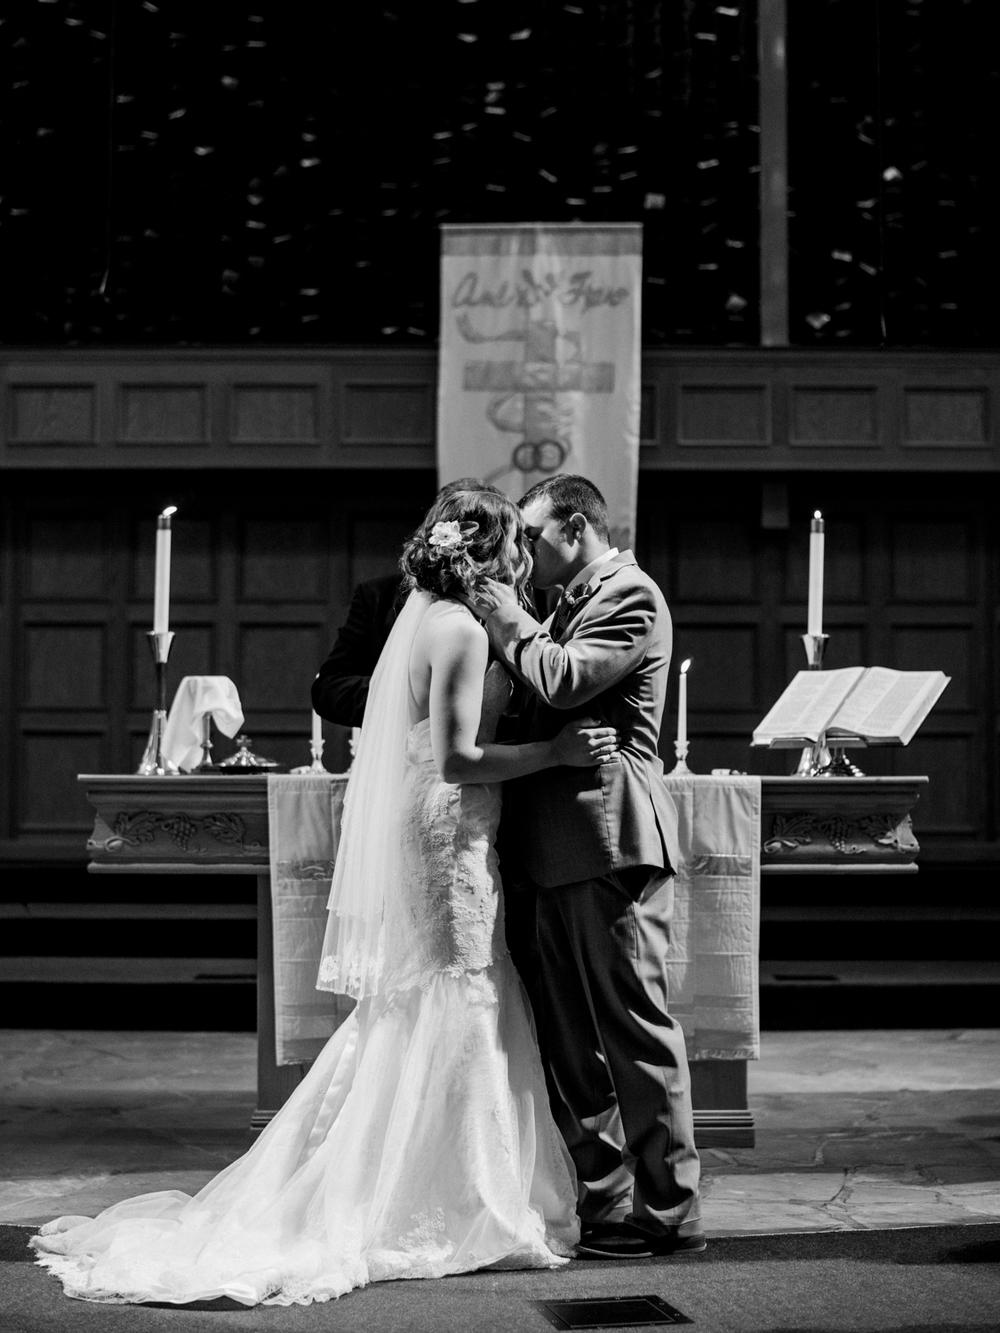 Dodge City, Kansas Wedding-Neal Dieker-Western Kansas Wedding Photographer-Dodge City, Kansas Wedding Photography-Wichita, Kansas Wedding Photographer-256.jpg